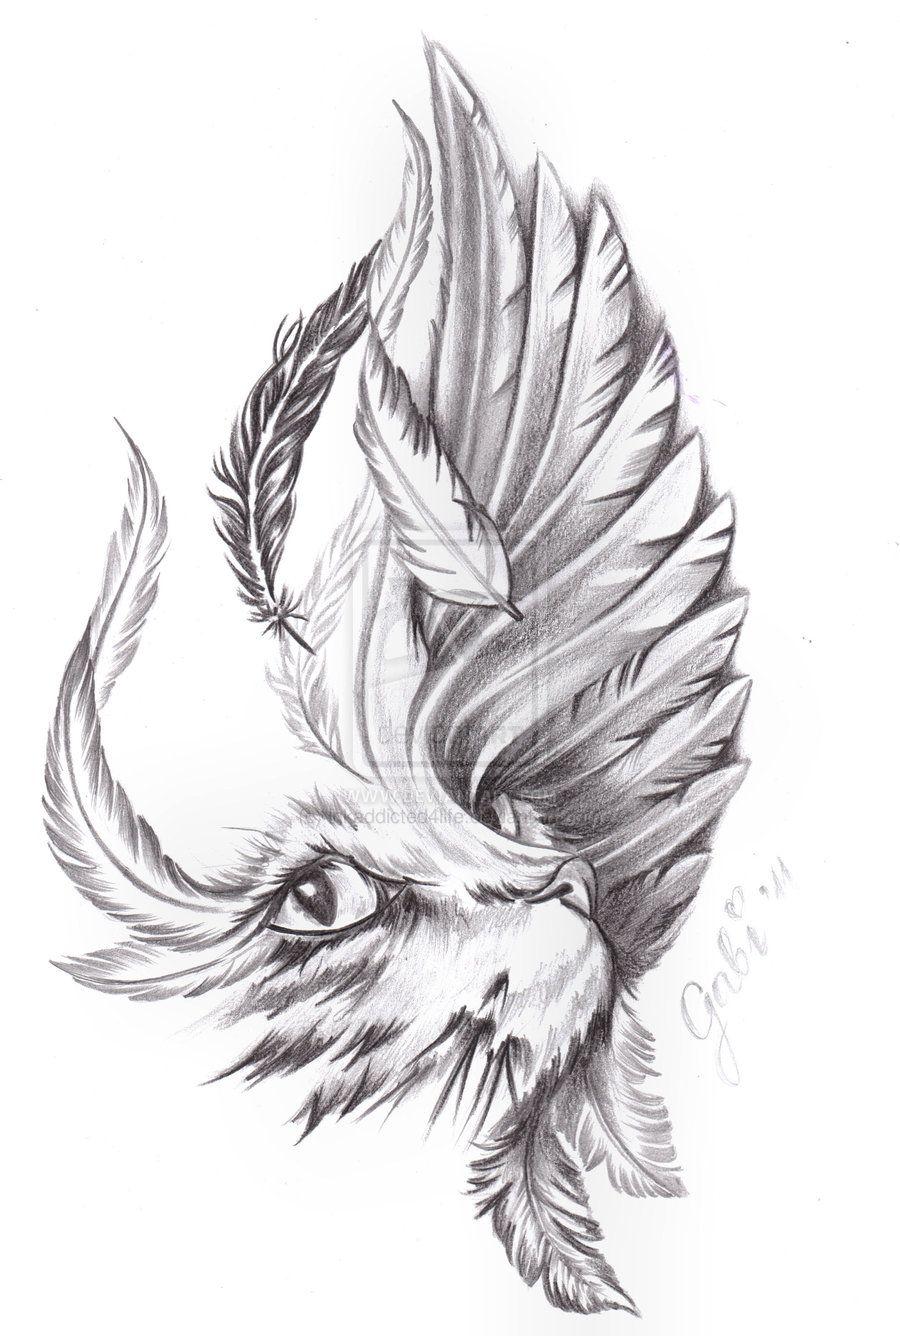 cat_and_bird_wing_by_inkaddicted4life-d5gkgdd.jpg (900×1336 ...